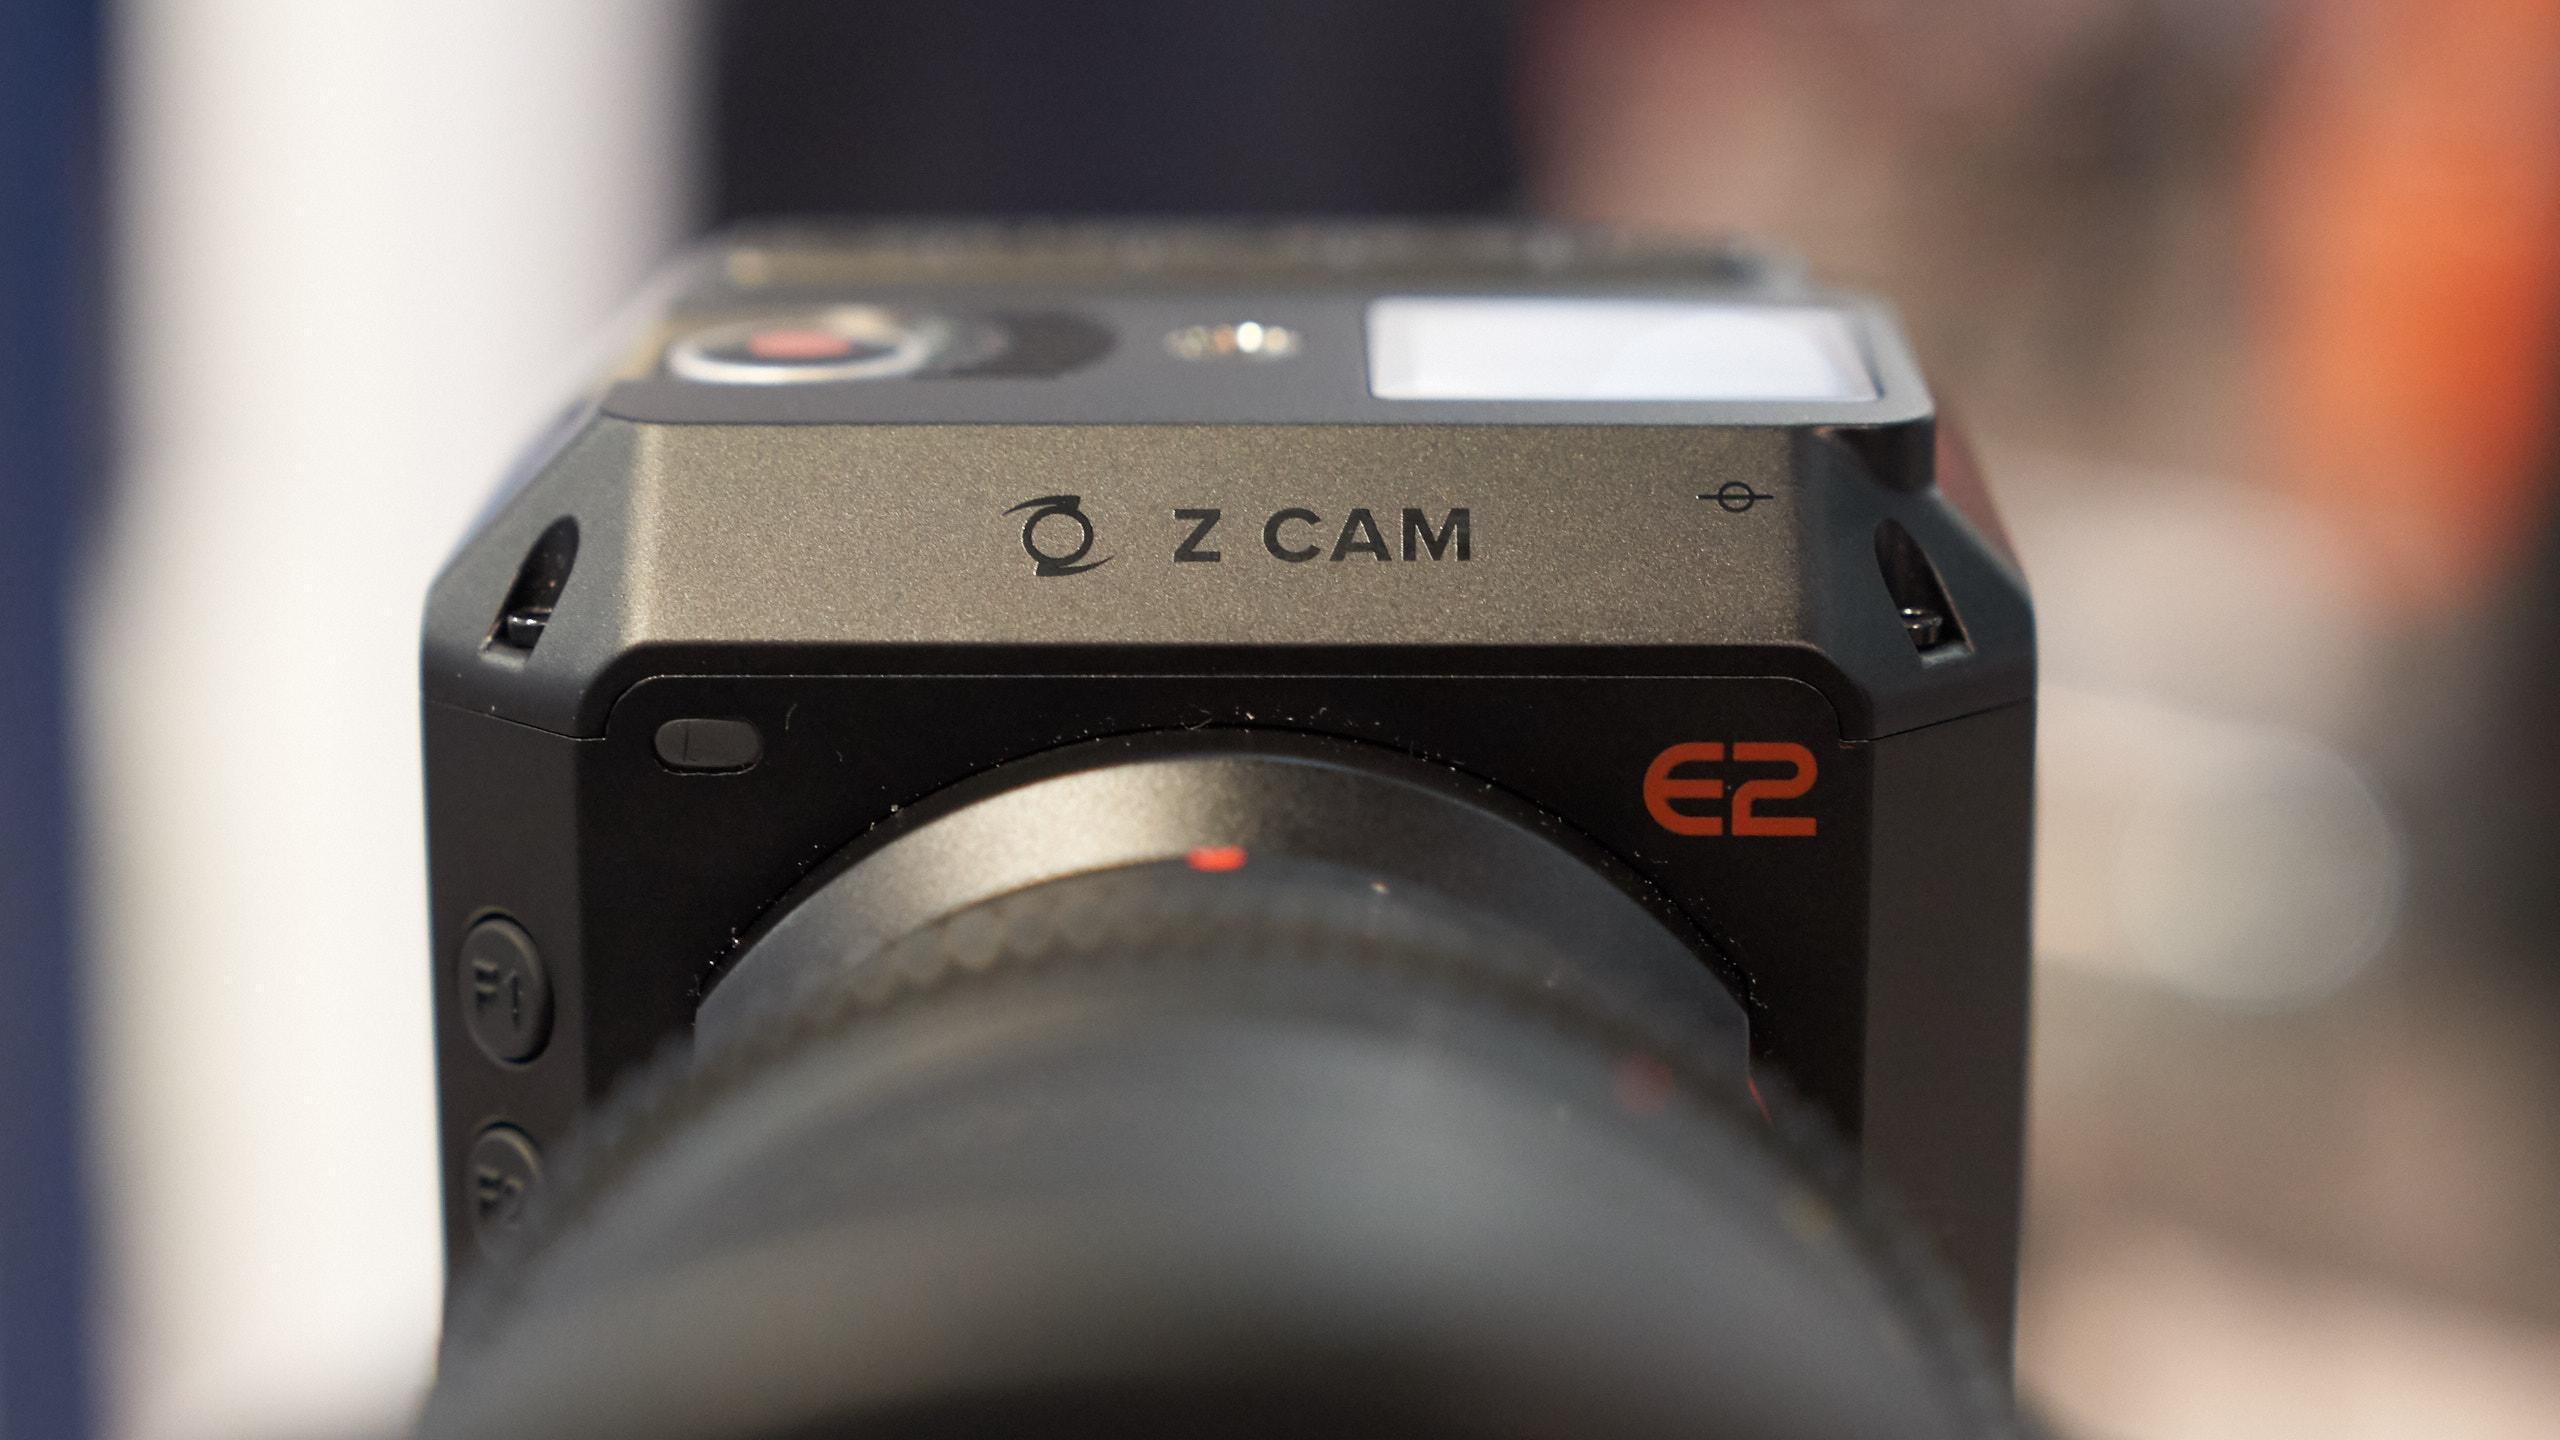 NAB 2018: Z CAM Shows Off the E2, with 4K at 120p | B&H Explora